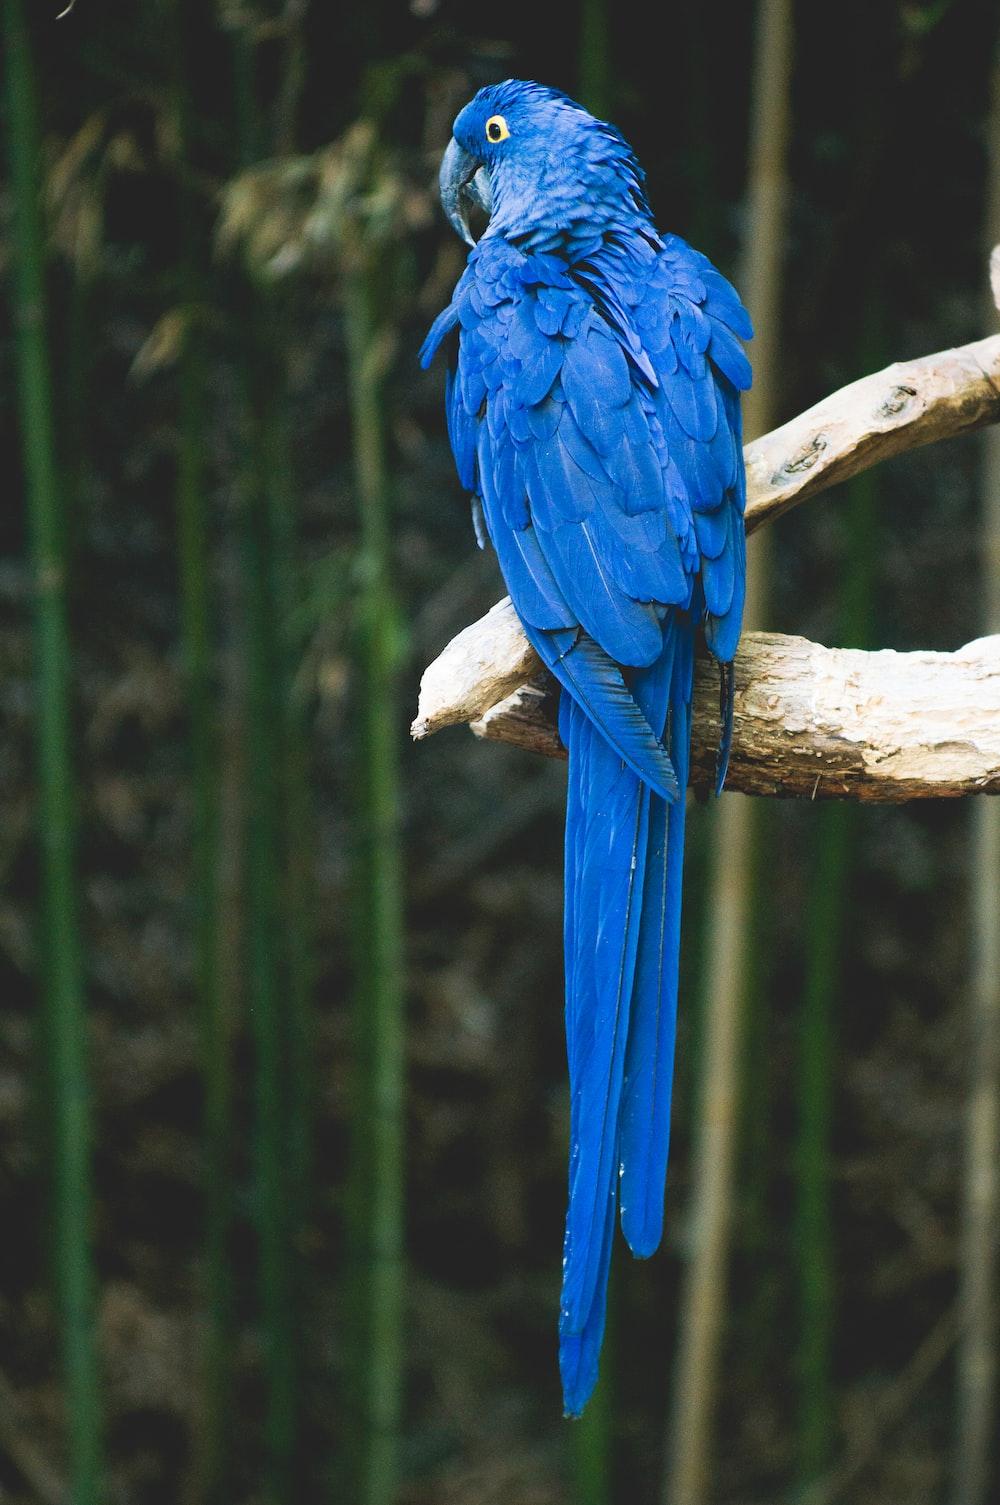 blue bird perch on brown tree